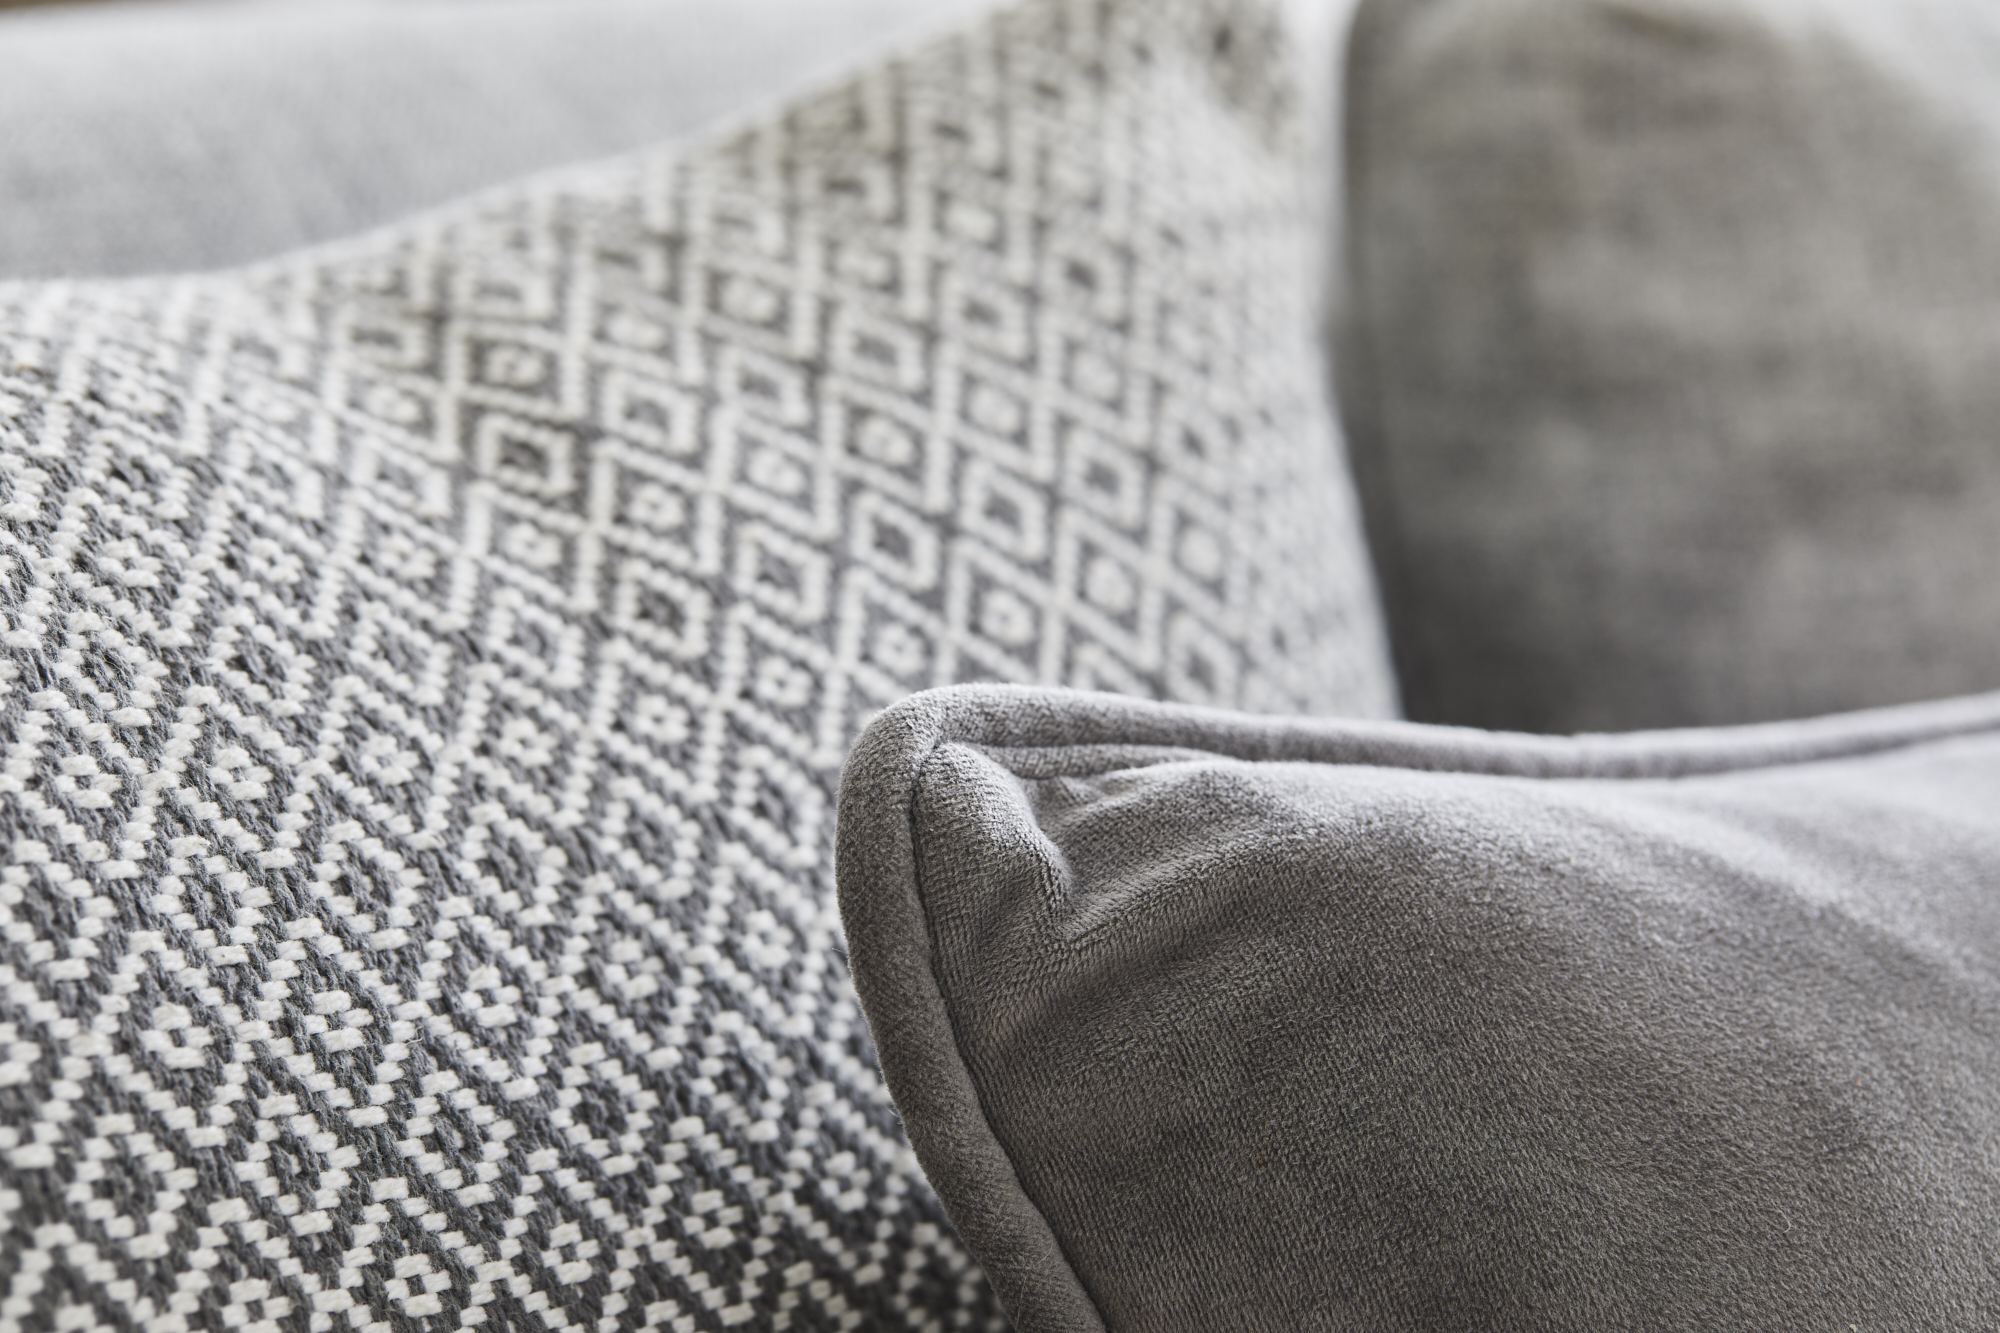 Bespoke cushion sourcing